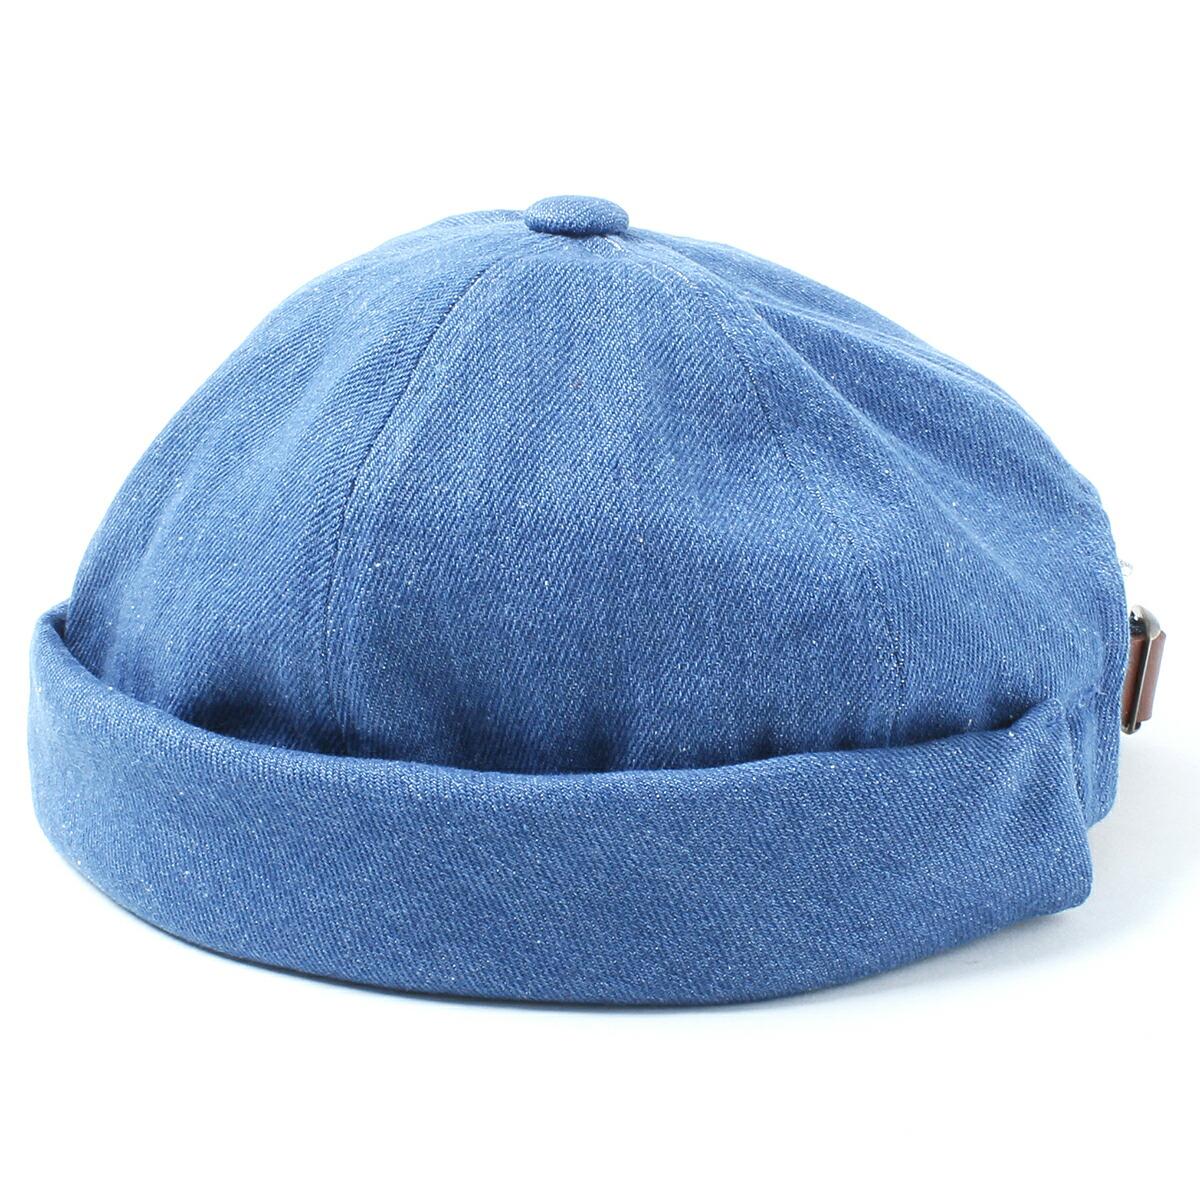 9670f133ee171 楽天市場】ベーシックエンチ Fisherman Cap (3色展開) 帽子 ...